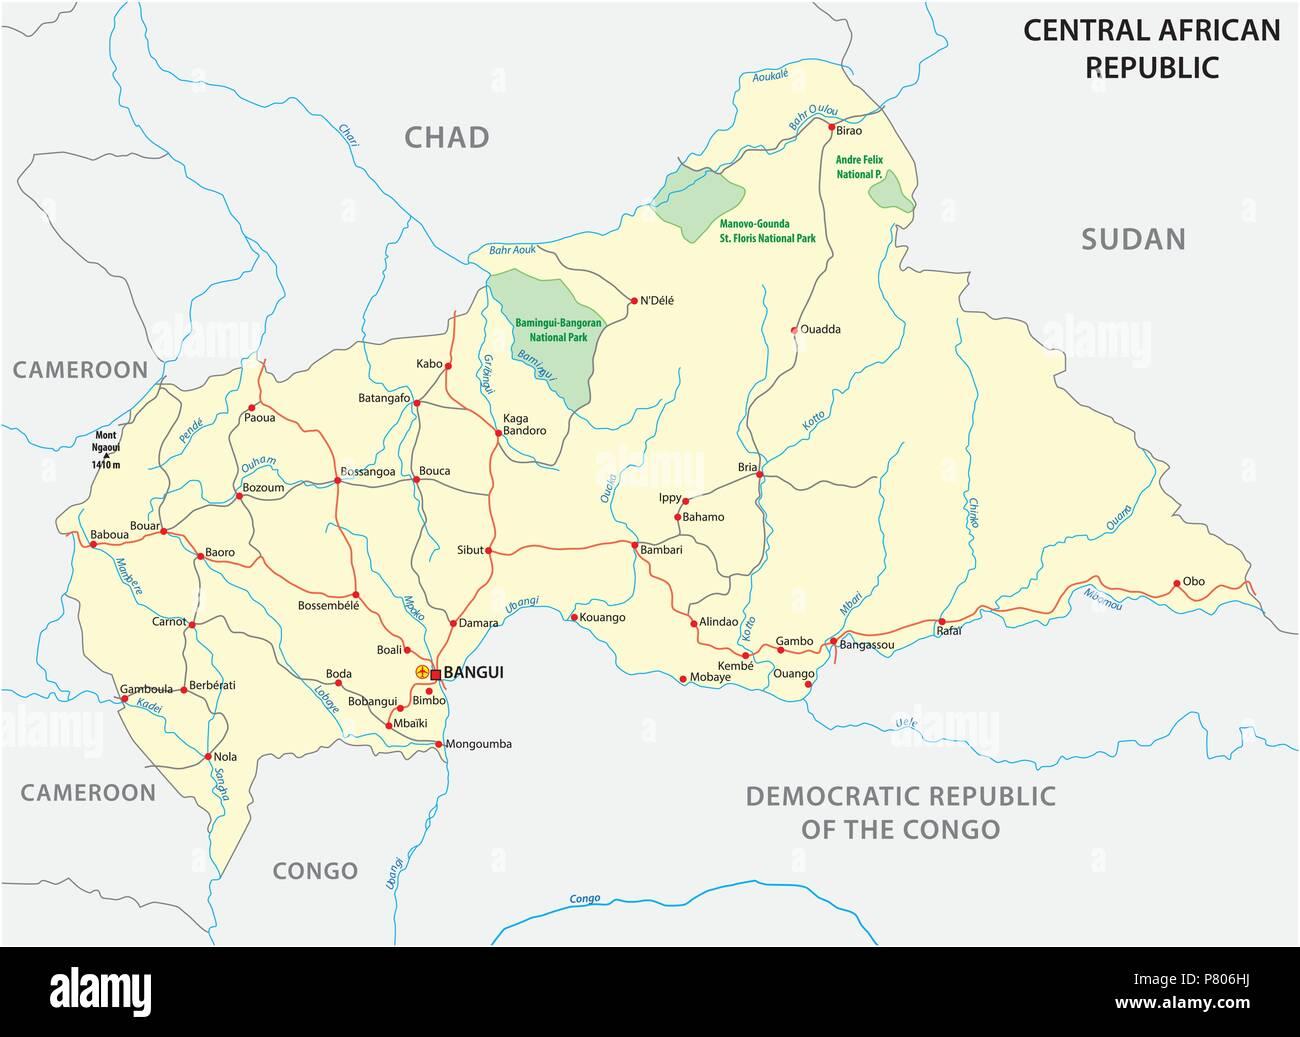 República Centroafricana road mapa vectorial Imagen De Stock